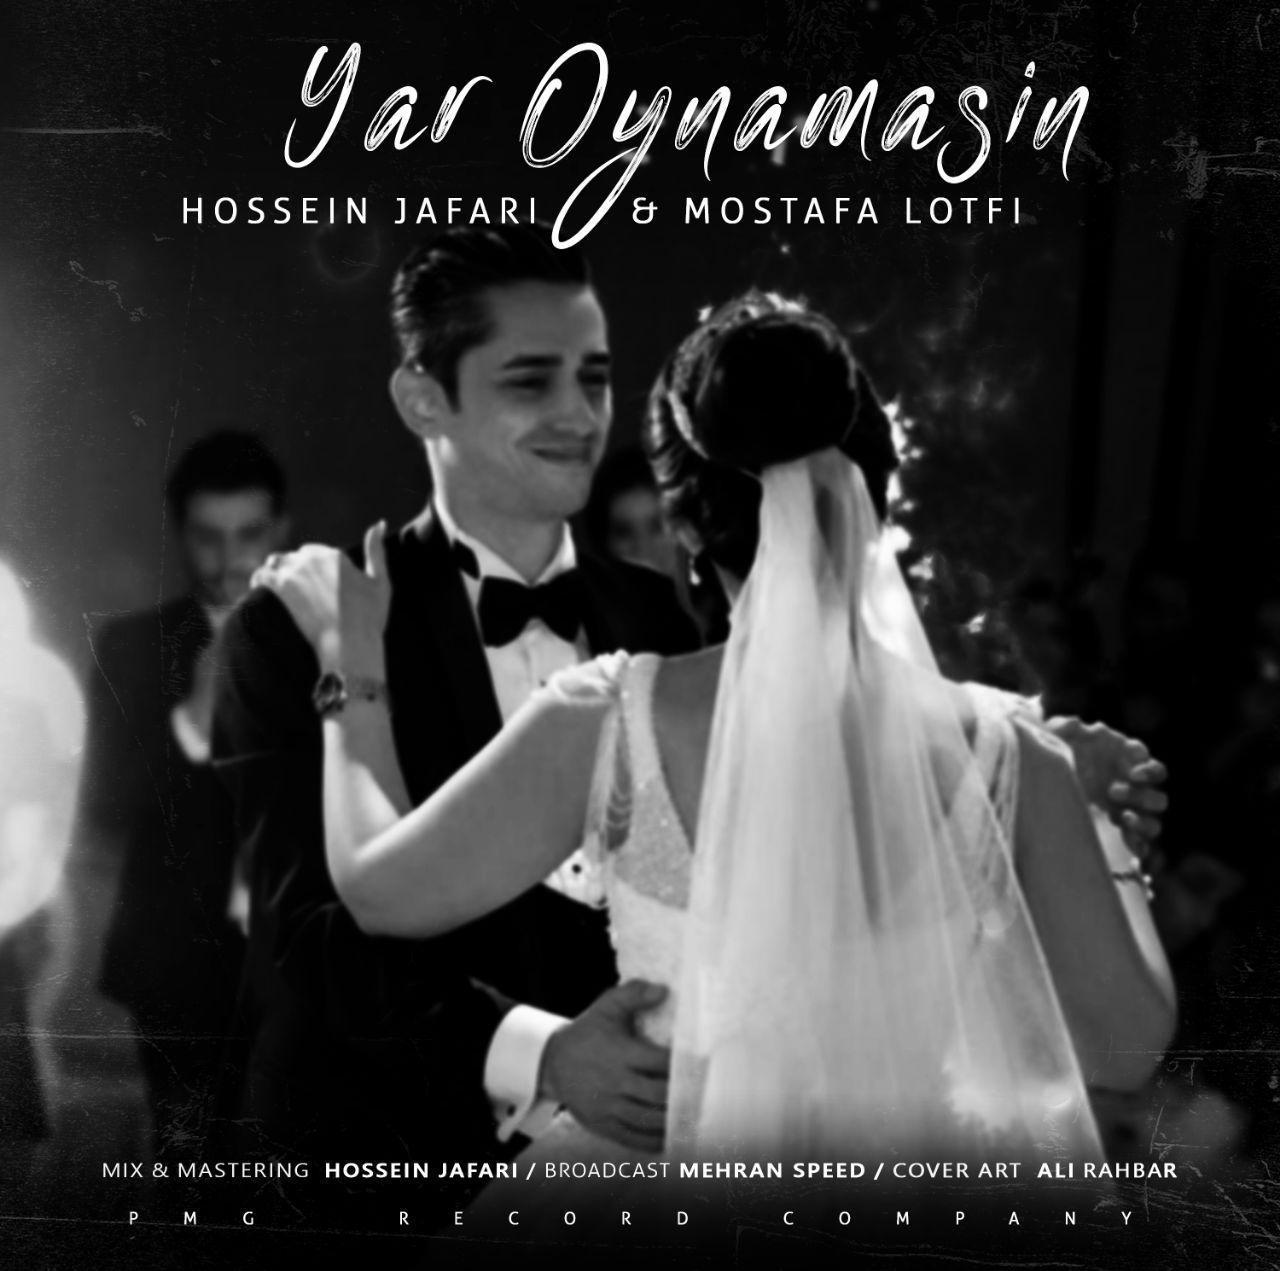 http://birtunes.ir/wp-content/uploads/2018/11/Hossein-Jafari-Mostafa-Lotfi-Yar-Oynamasin.jpg